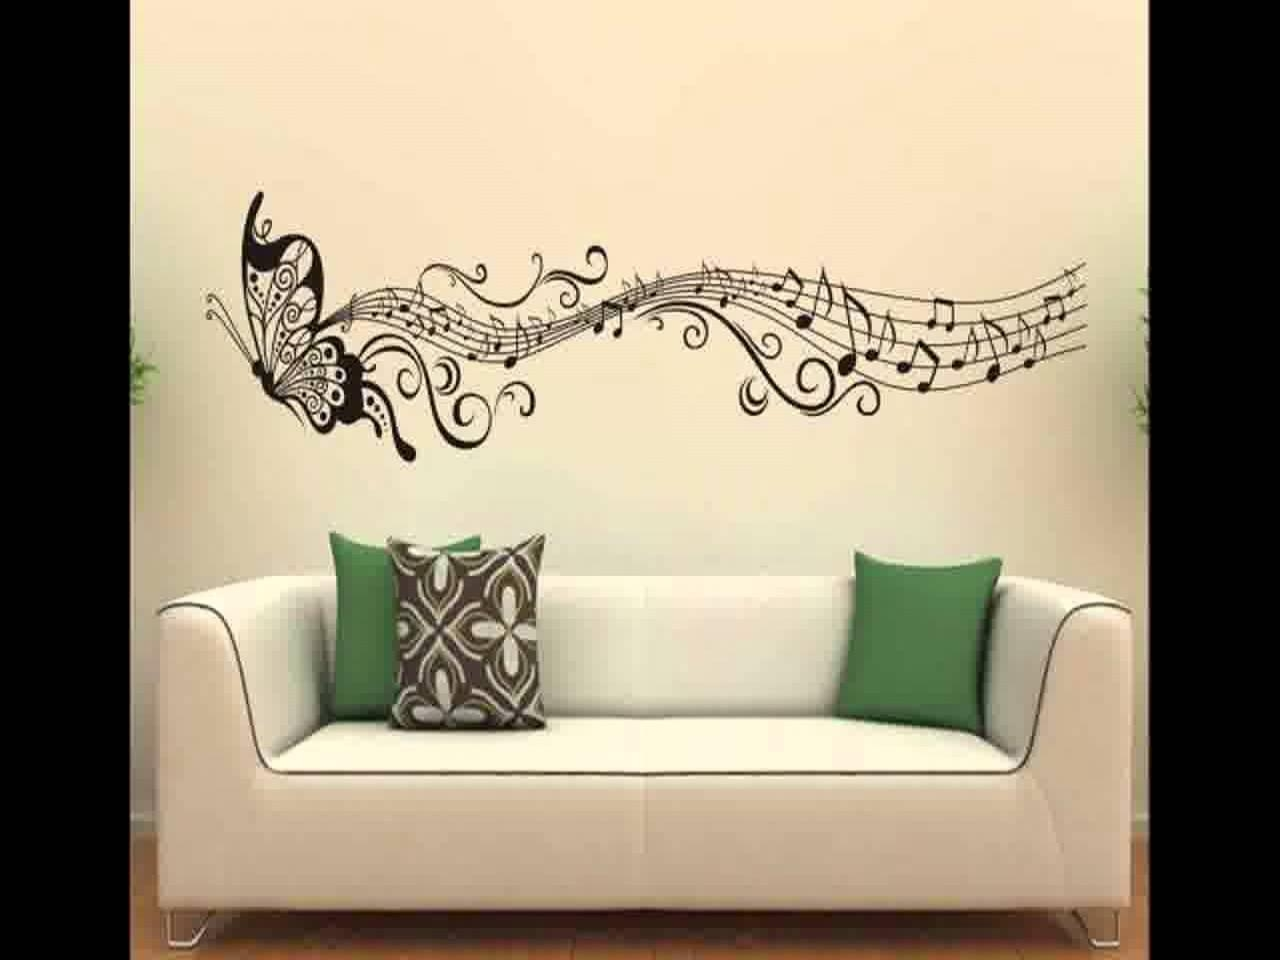 Acrylic Wall Art Design Ideas – Youtube Regarding Wall Art Designs (View 12 of 20)